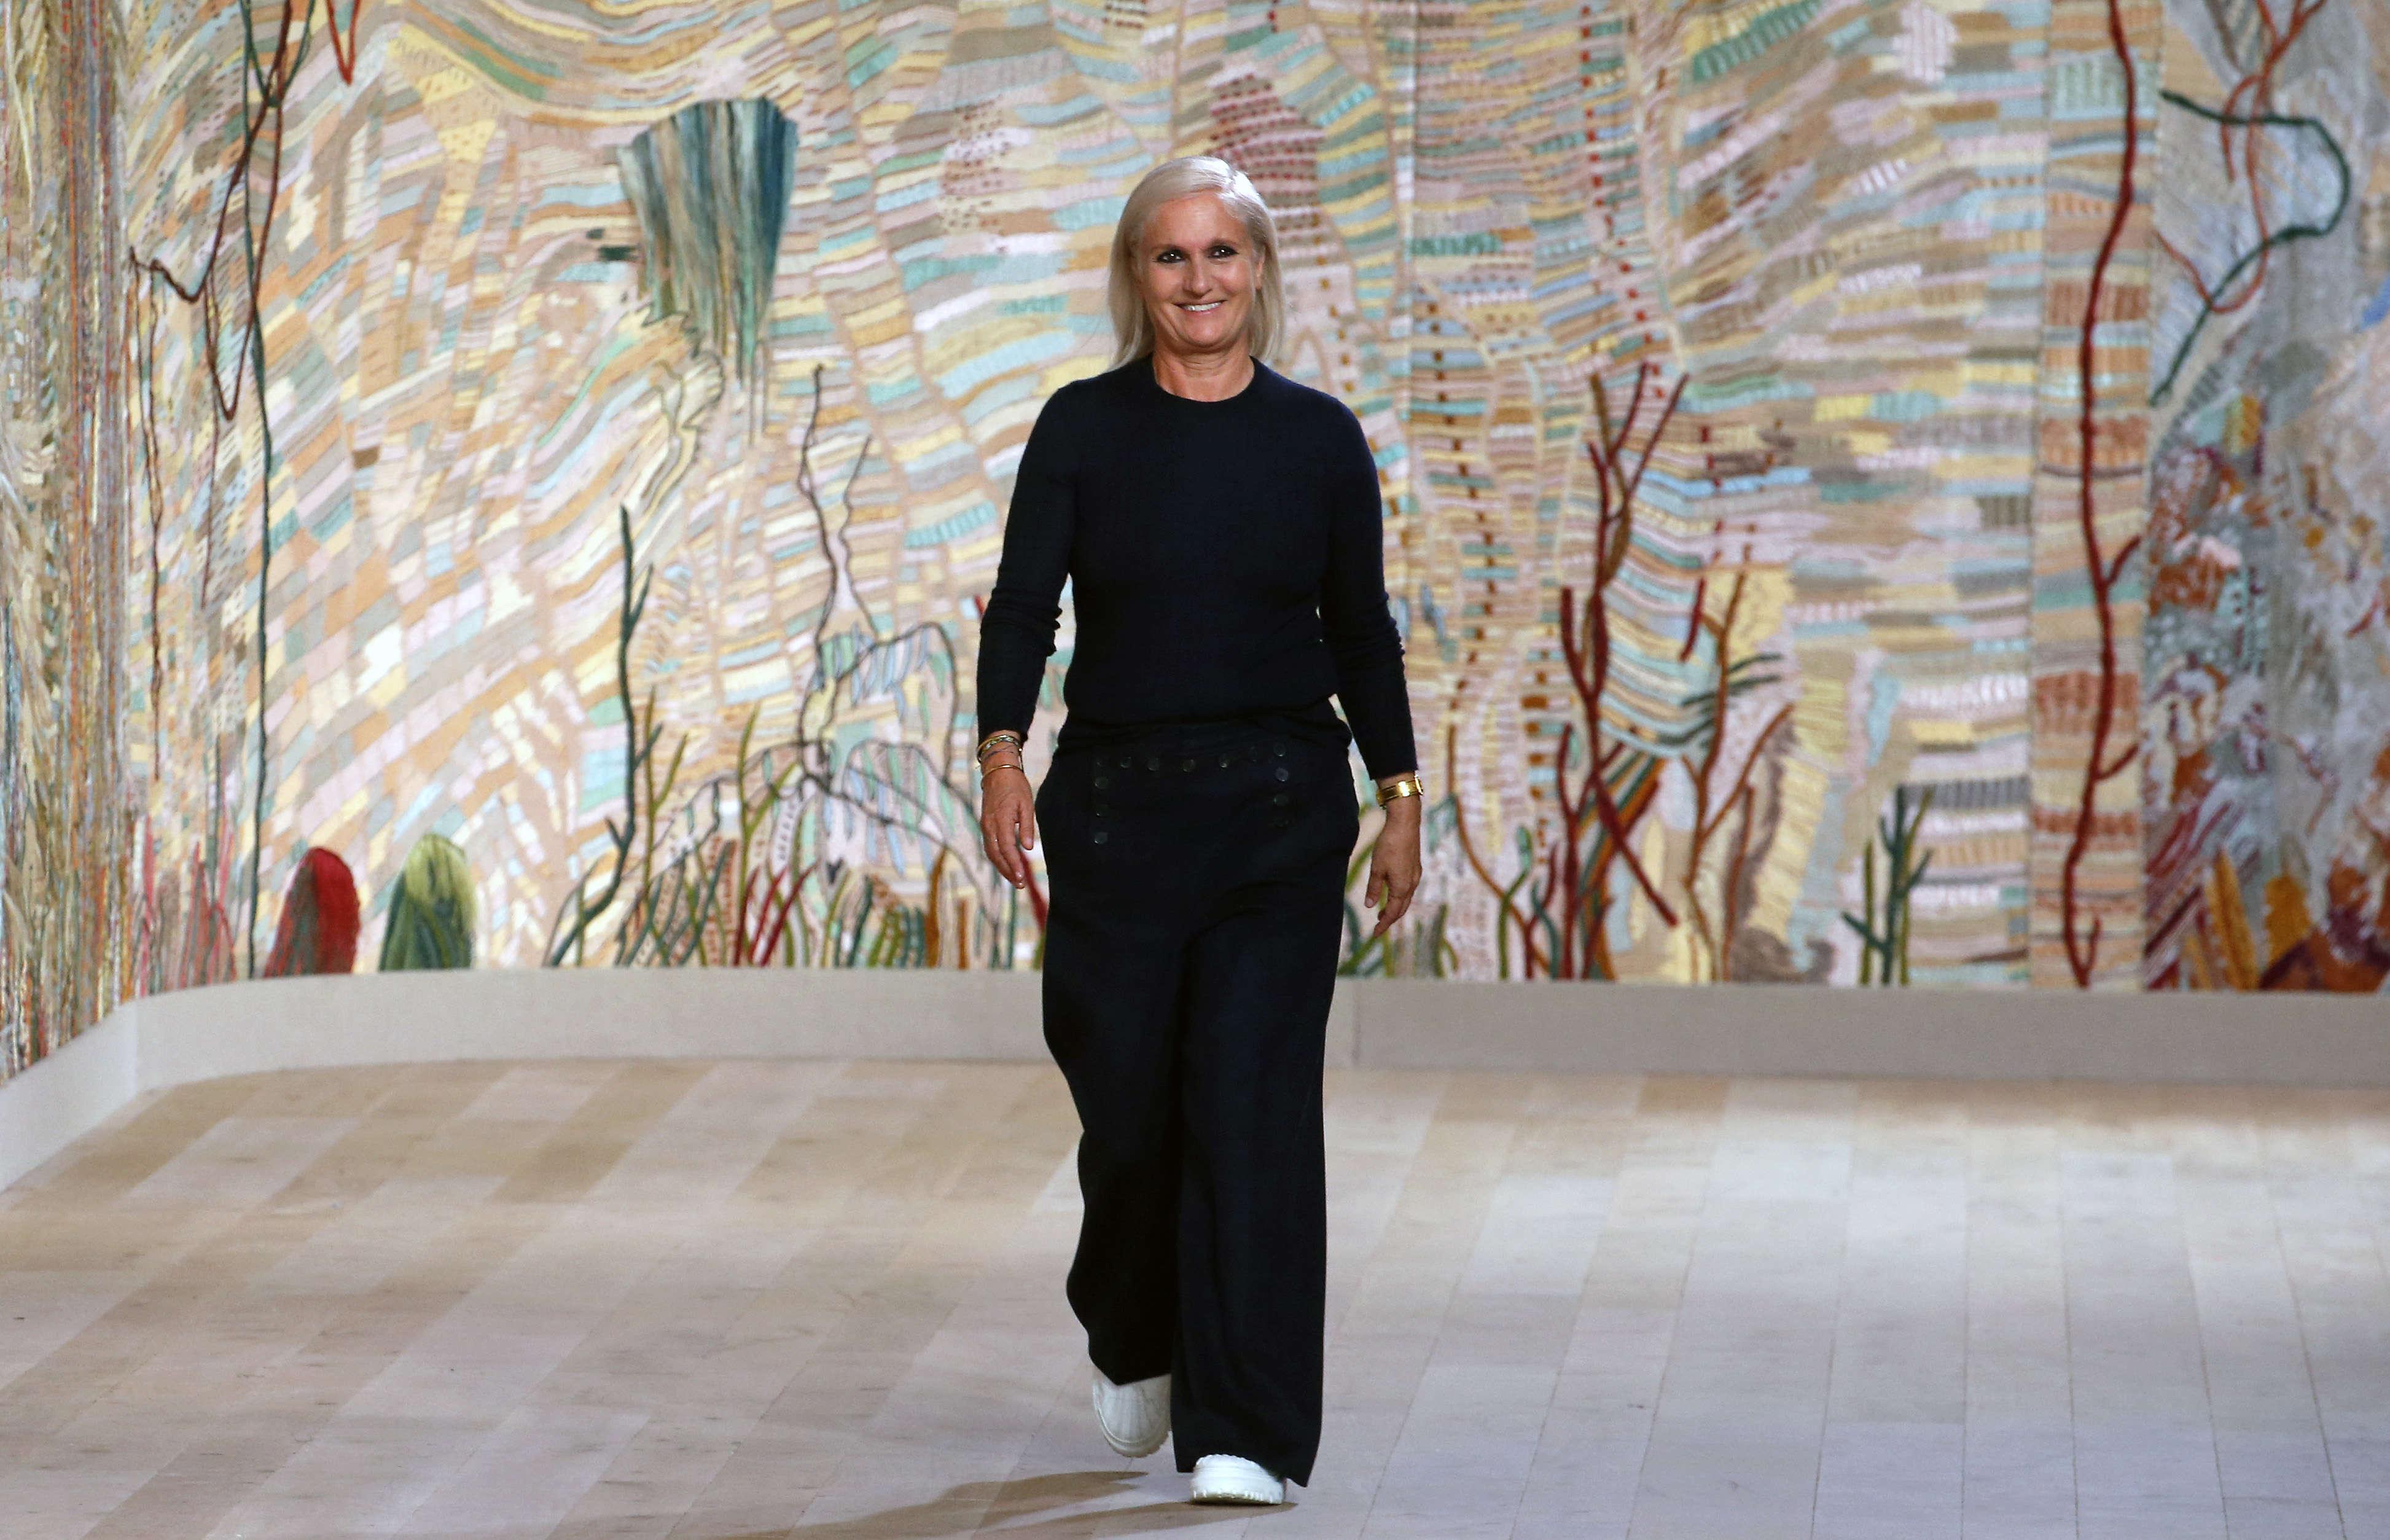 Dior's Maria Grazia Chiuri used a backdrop embroidered by Mumbai's Chanakya School of Art